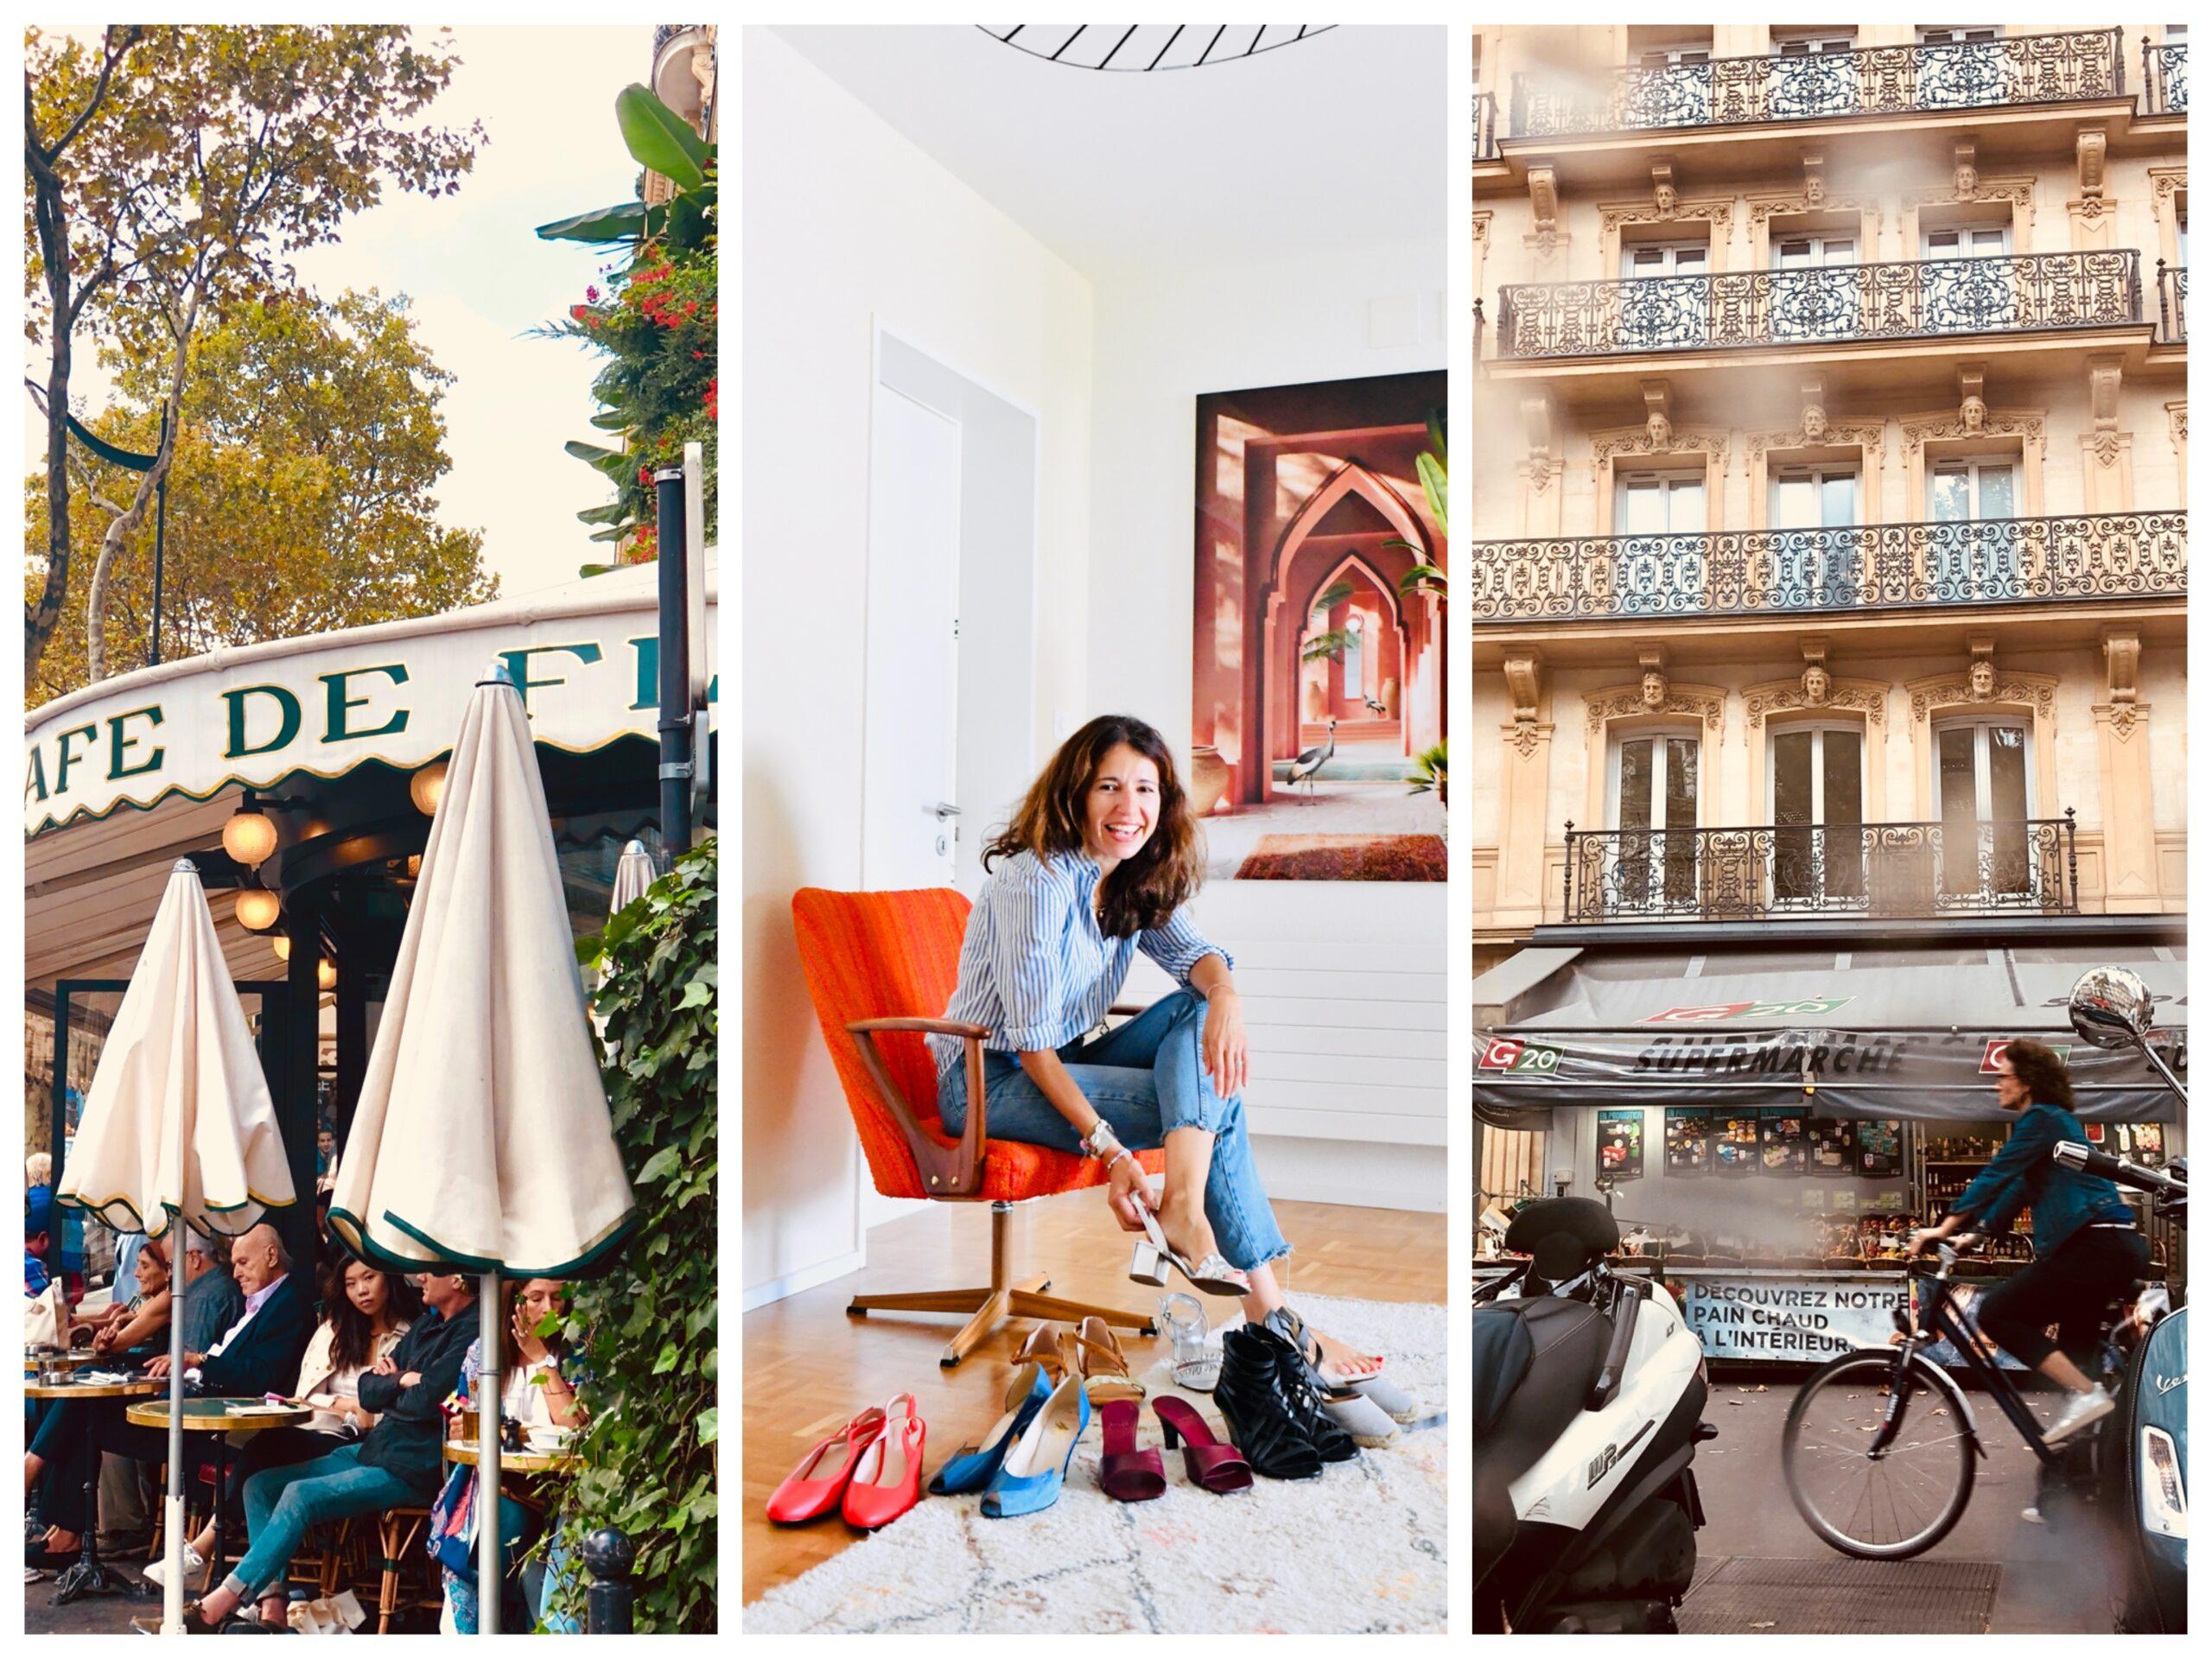 Fashion Conscious the Parisian Way